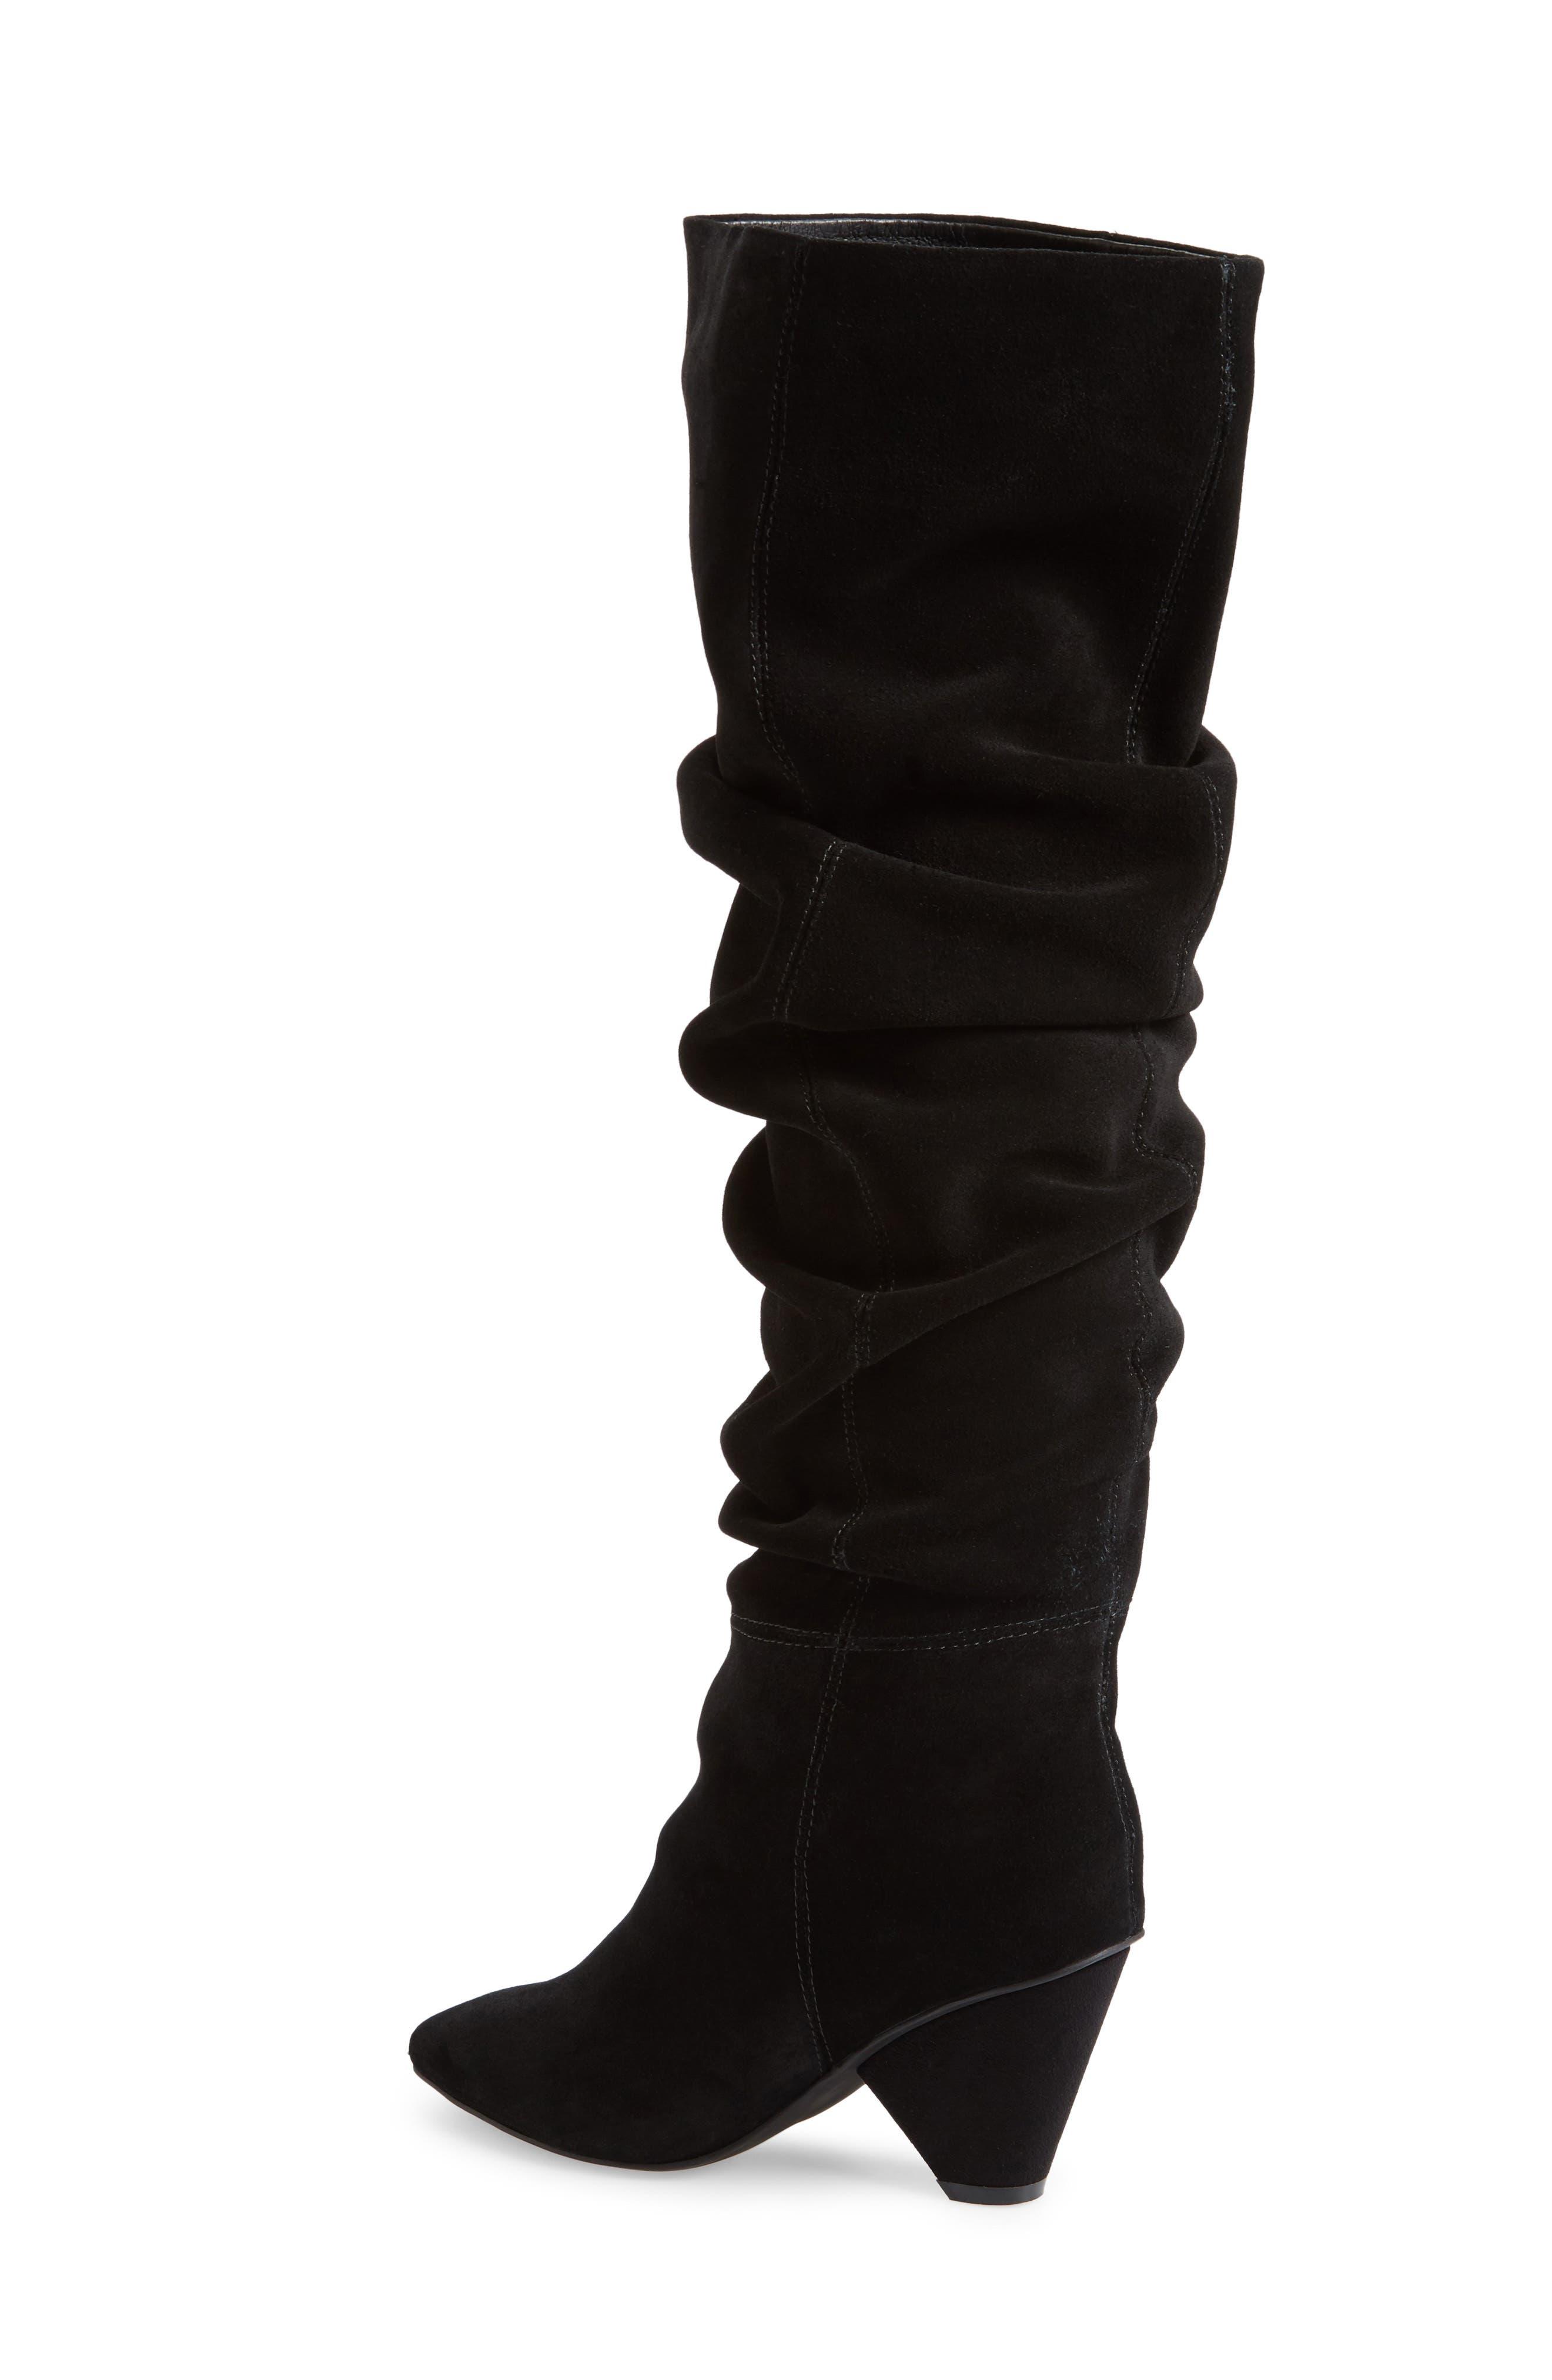 Senita Over the Knee Boot,                             Alternate thumbnail 2, color,                             005